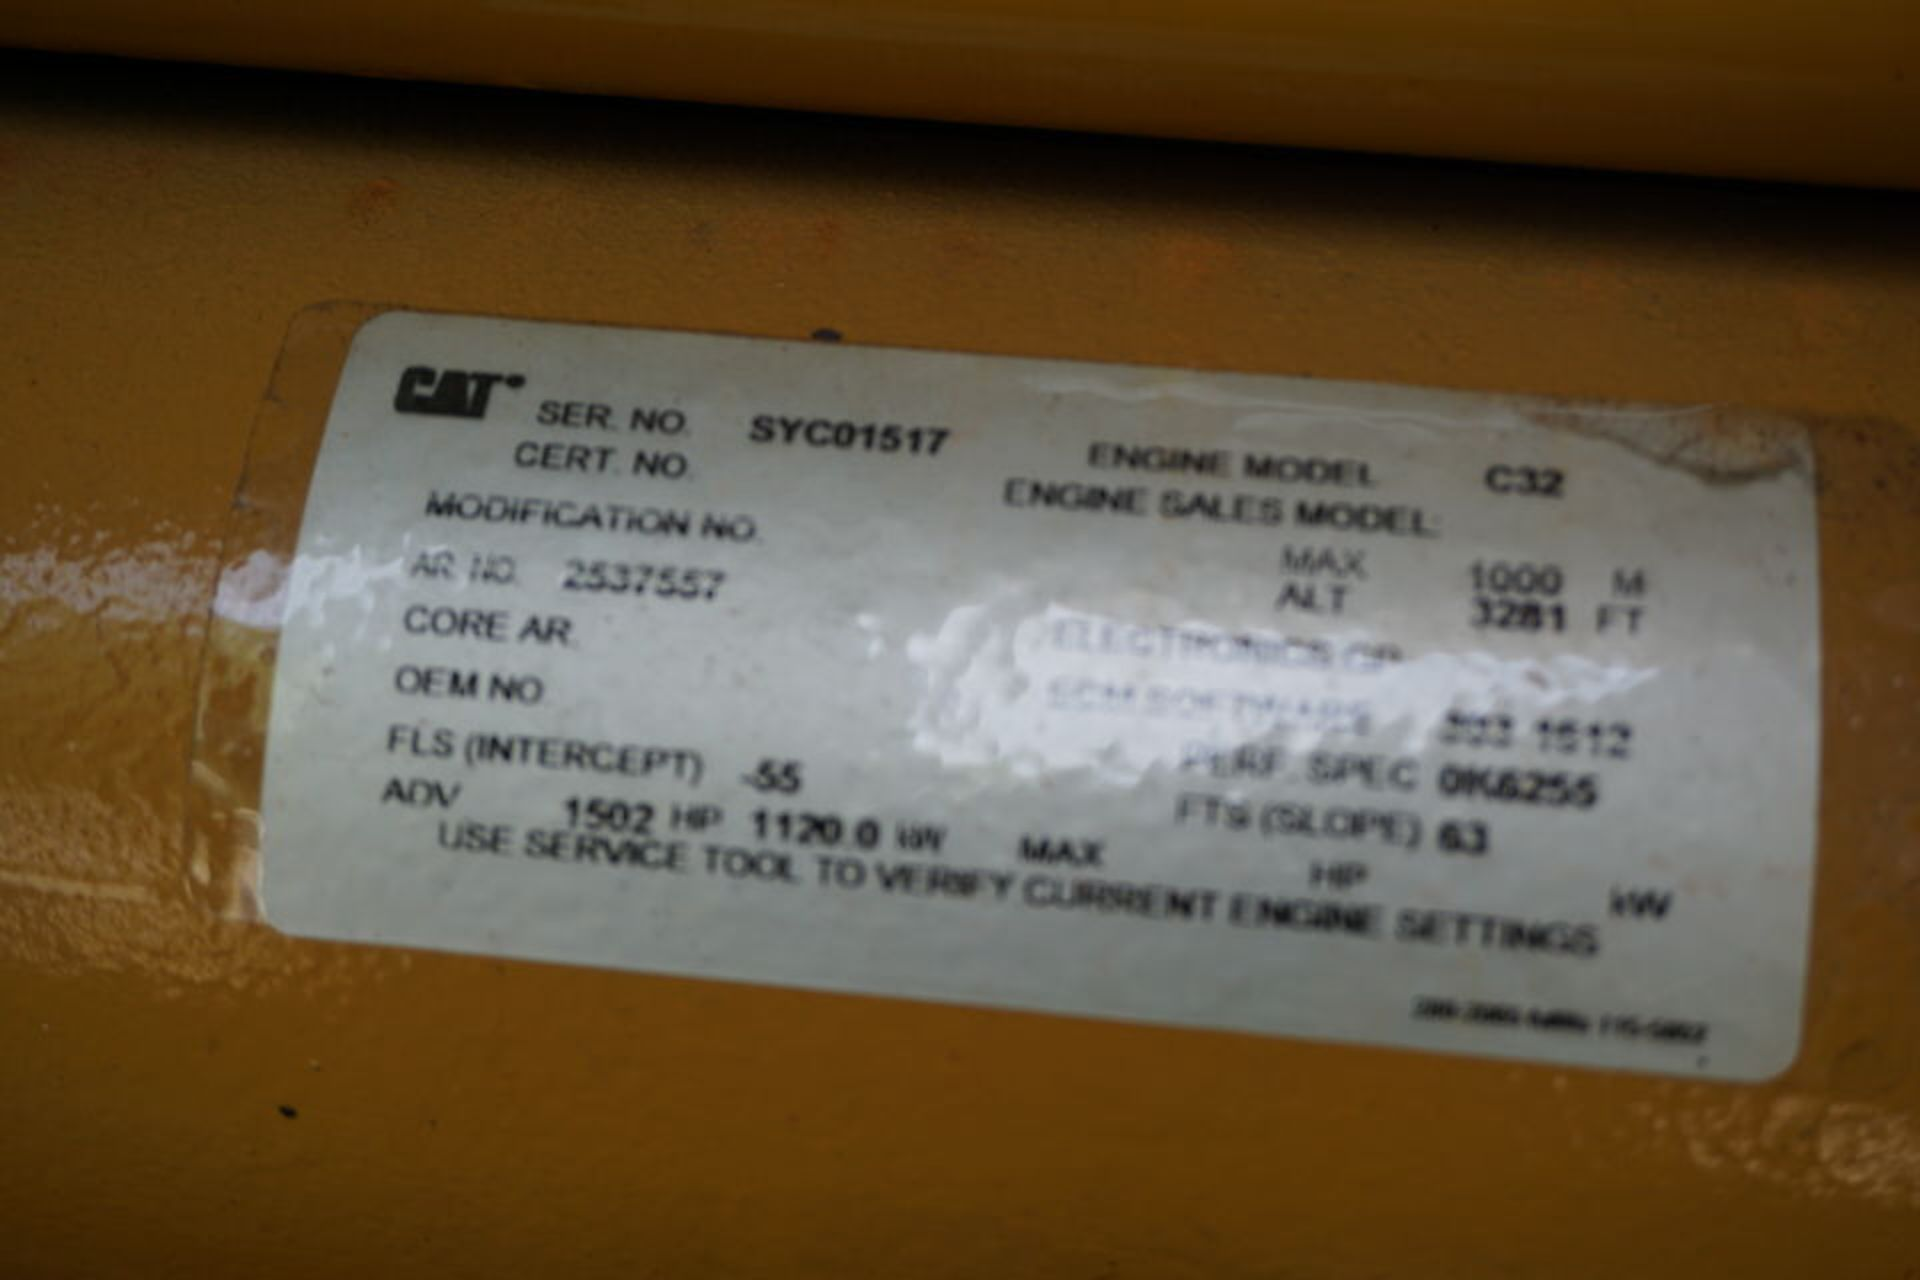 2007 CATERPILLAR BACK UP GENERATOR, ENGINE MODEL: C32 W/ EMCP3.3 CONTROL, 173.9 HOURS, 1250 KVA - Image 16 of 25